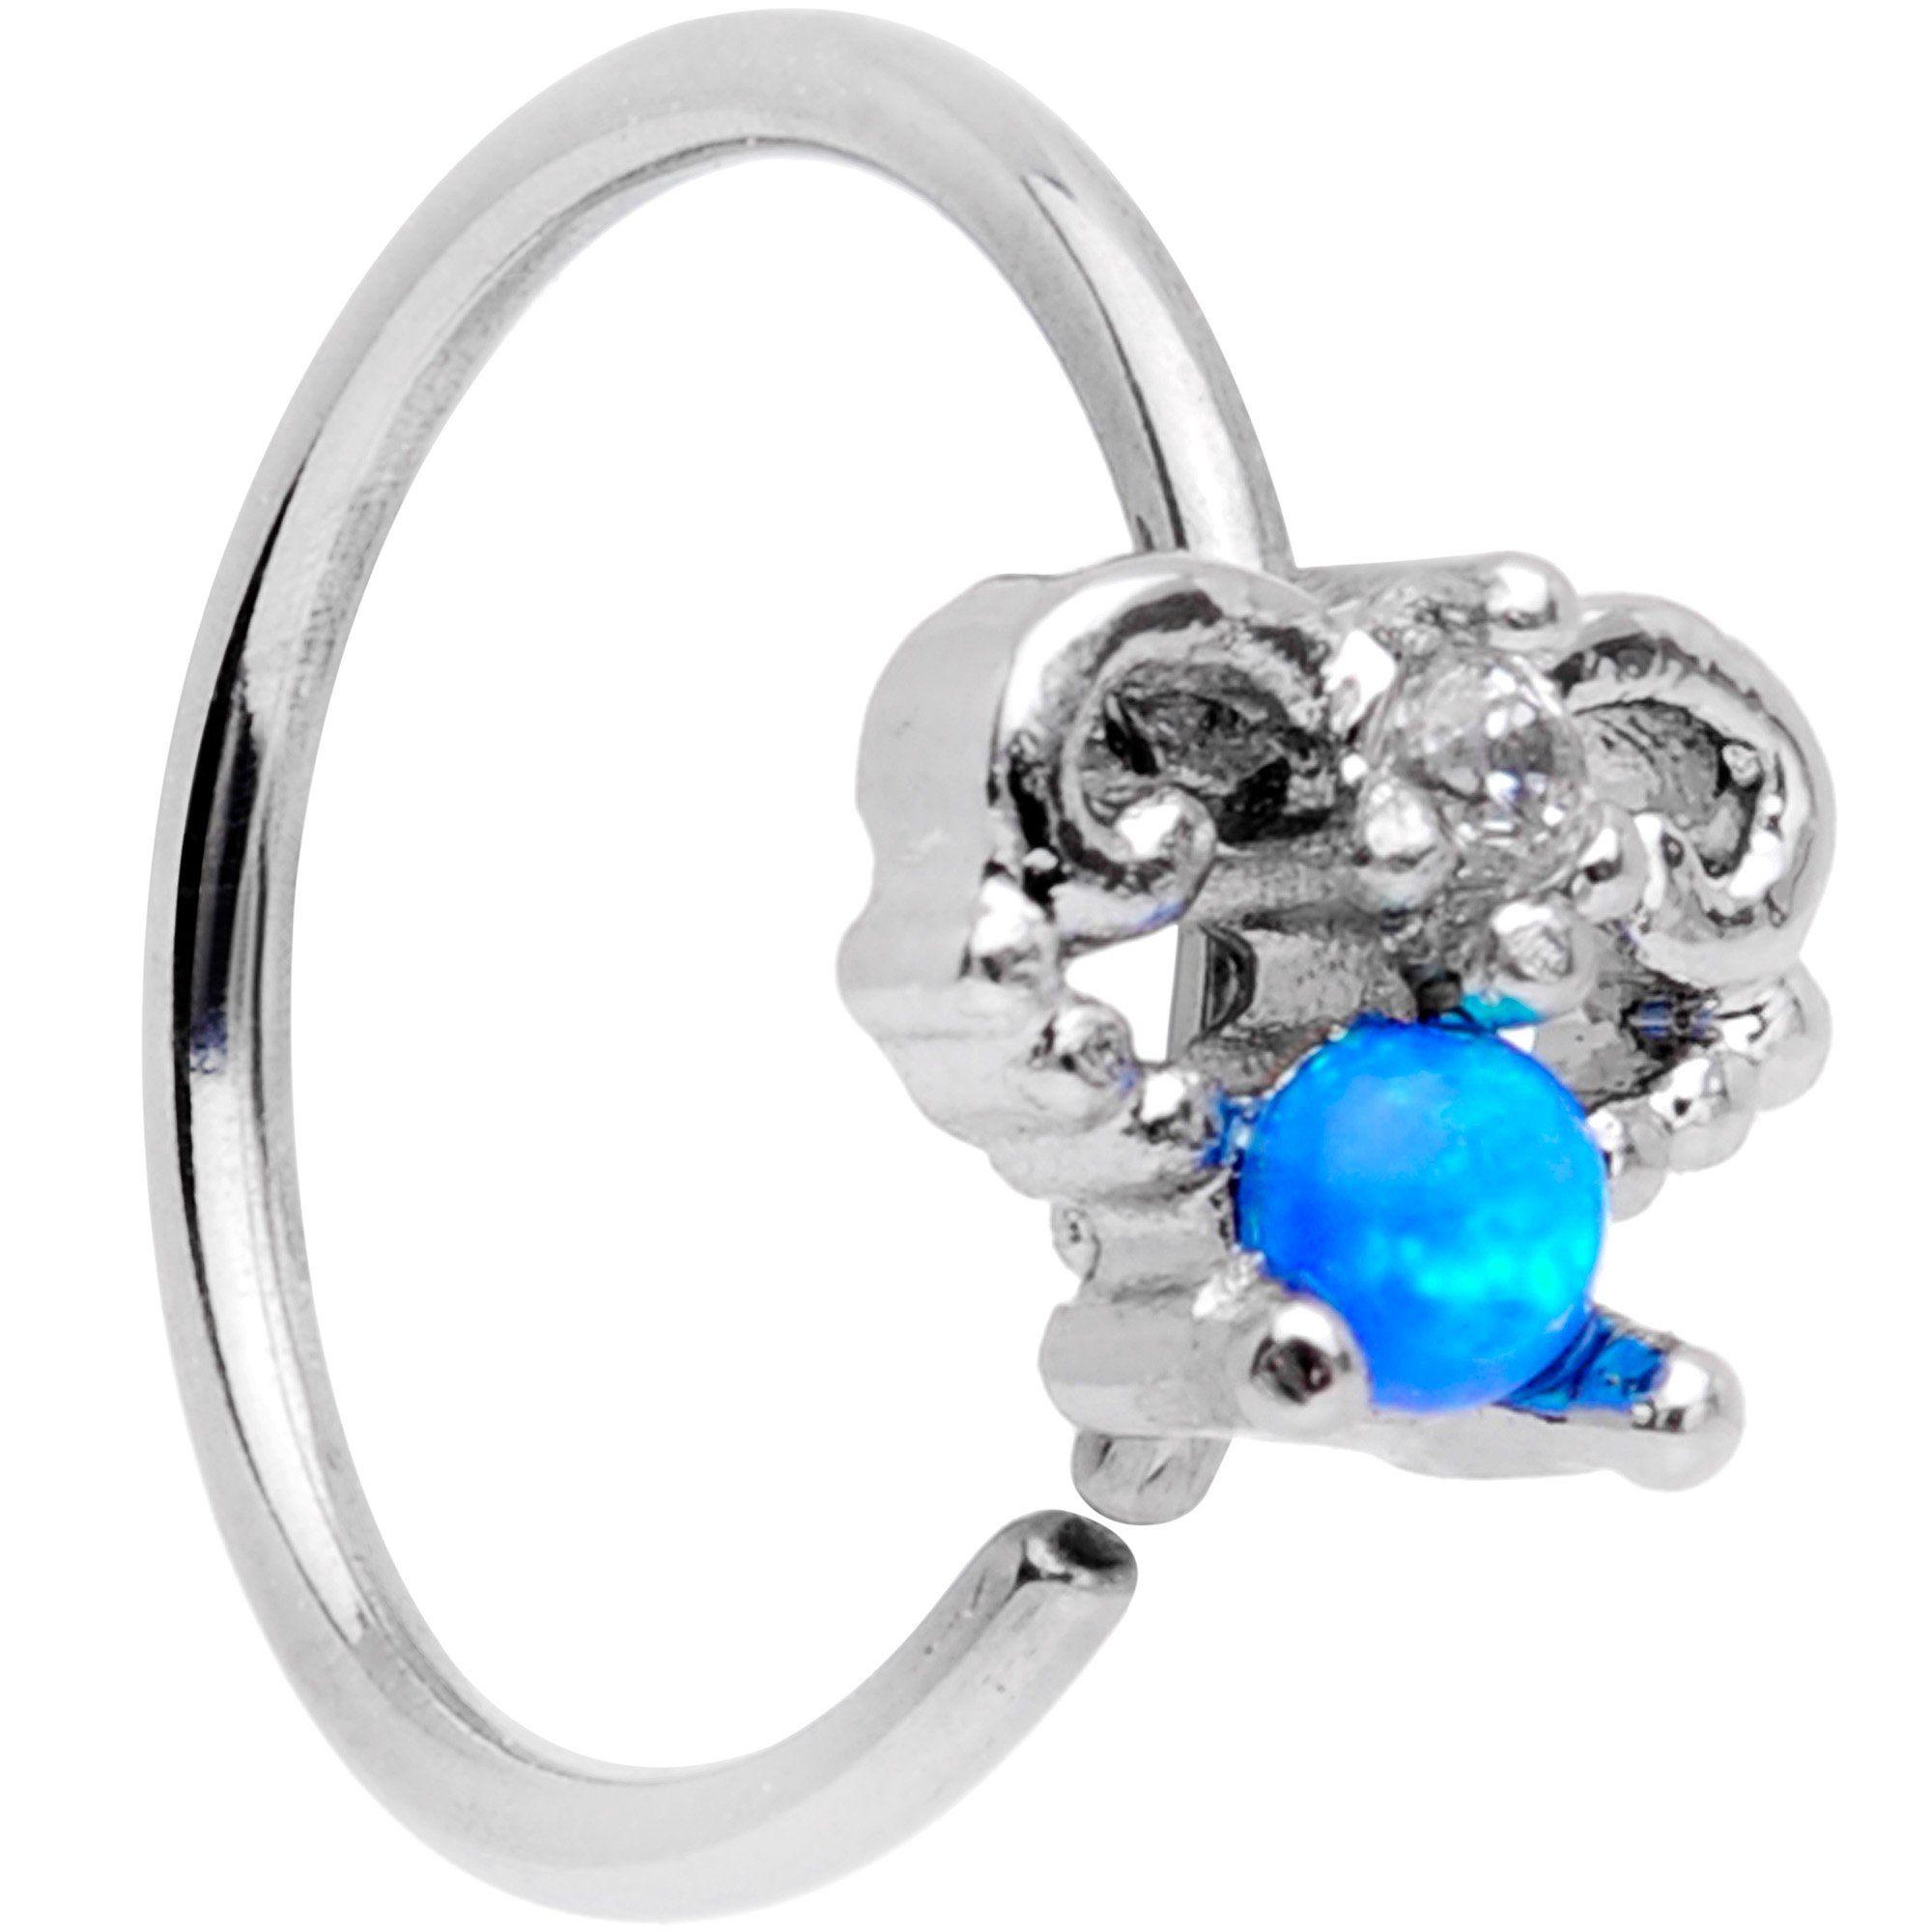 20 Gauge 5/16 Blue Synthetic Opal Fashion Seamless Circular Ring